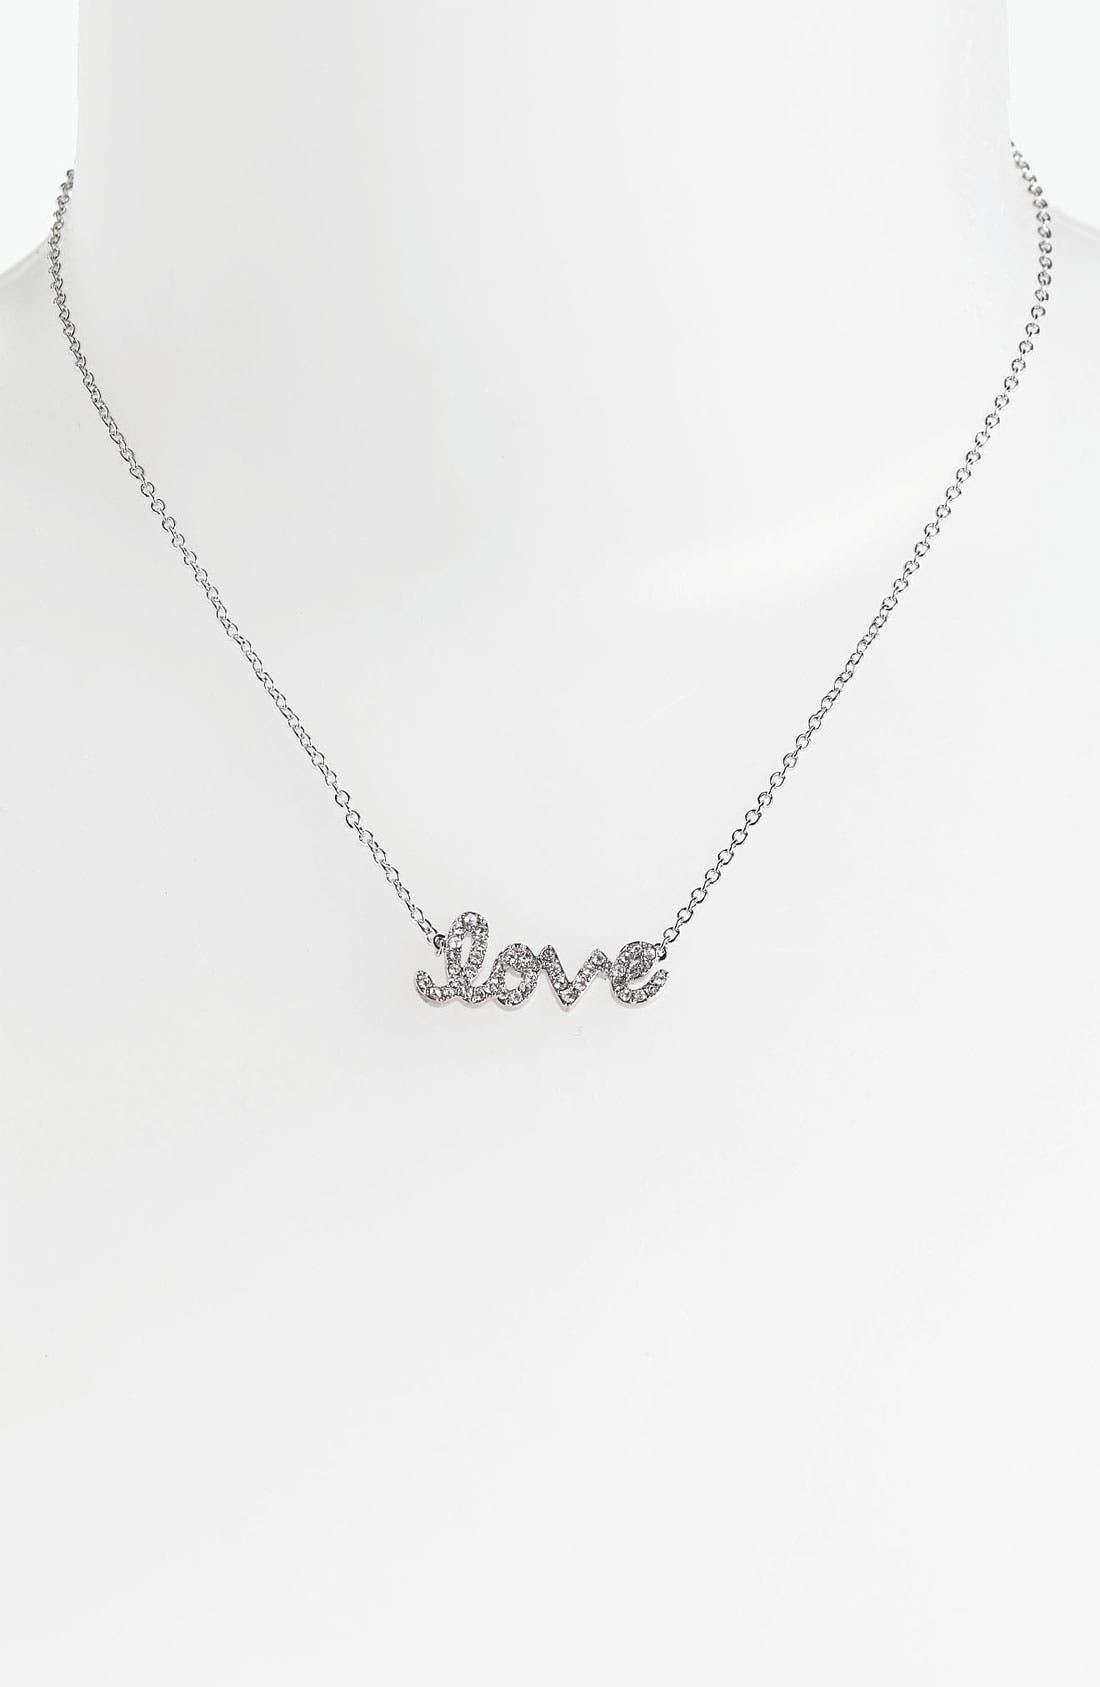 Main Image - Ariella Collection 'Messages - Love' Script Pendant Necklace